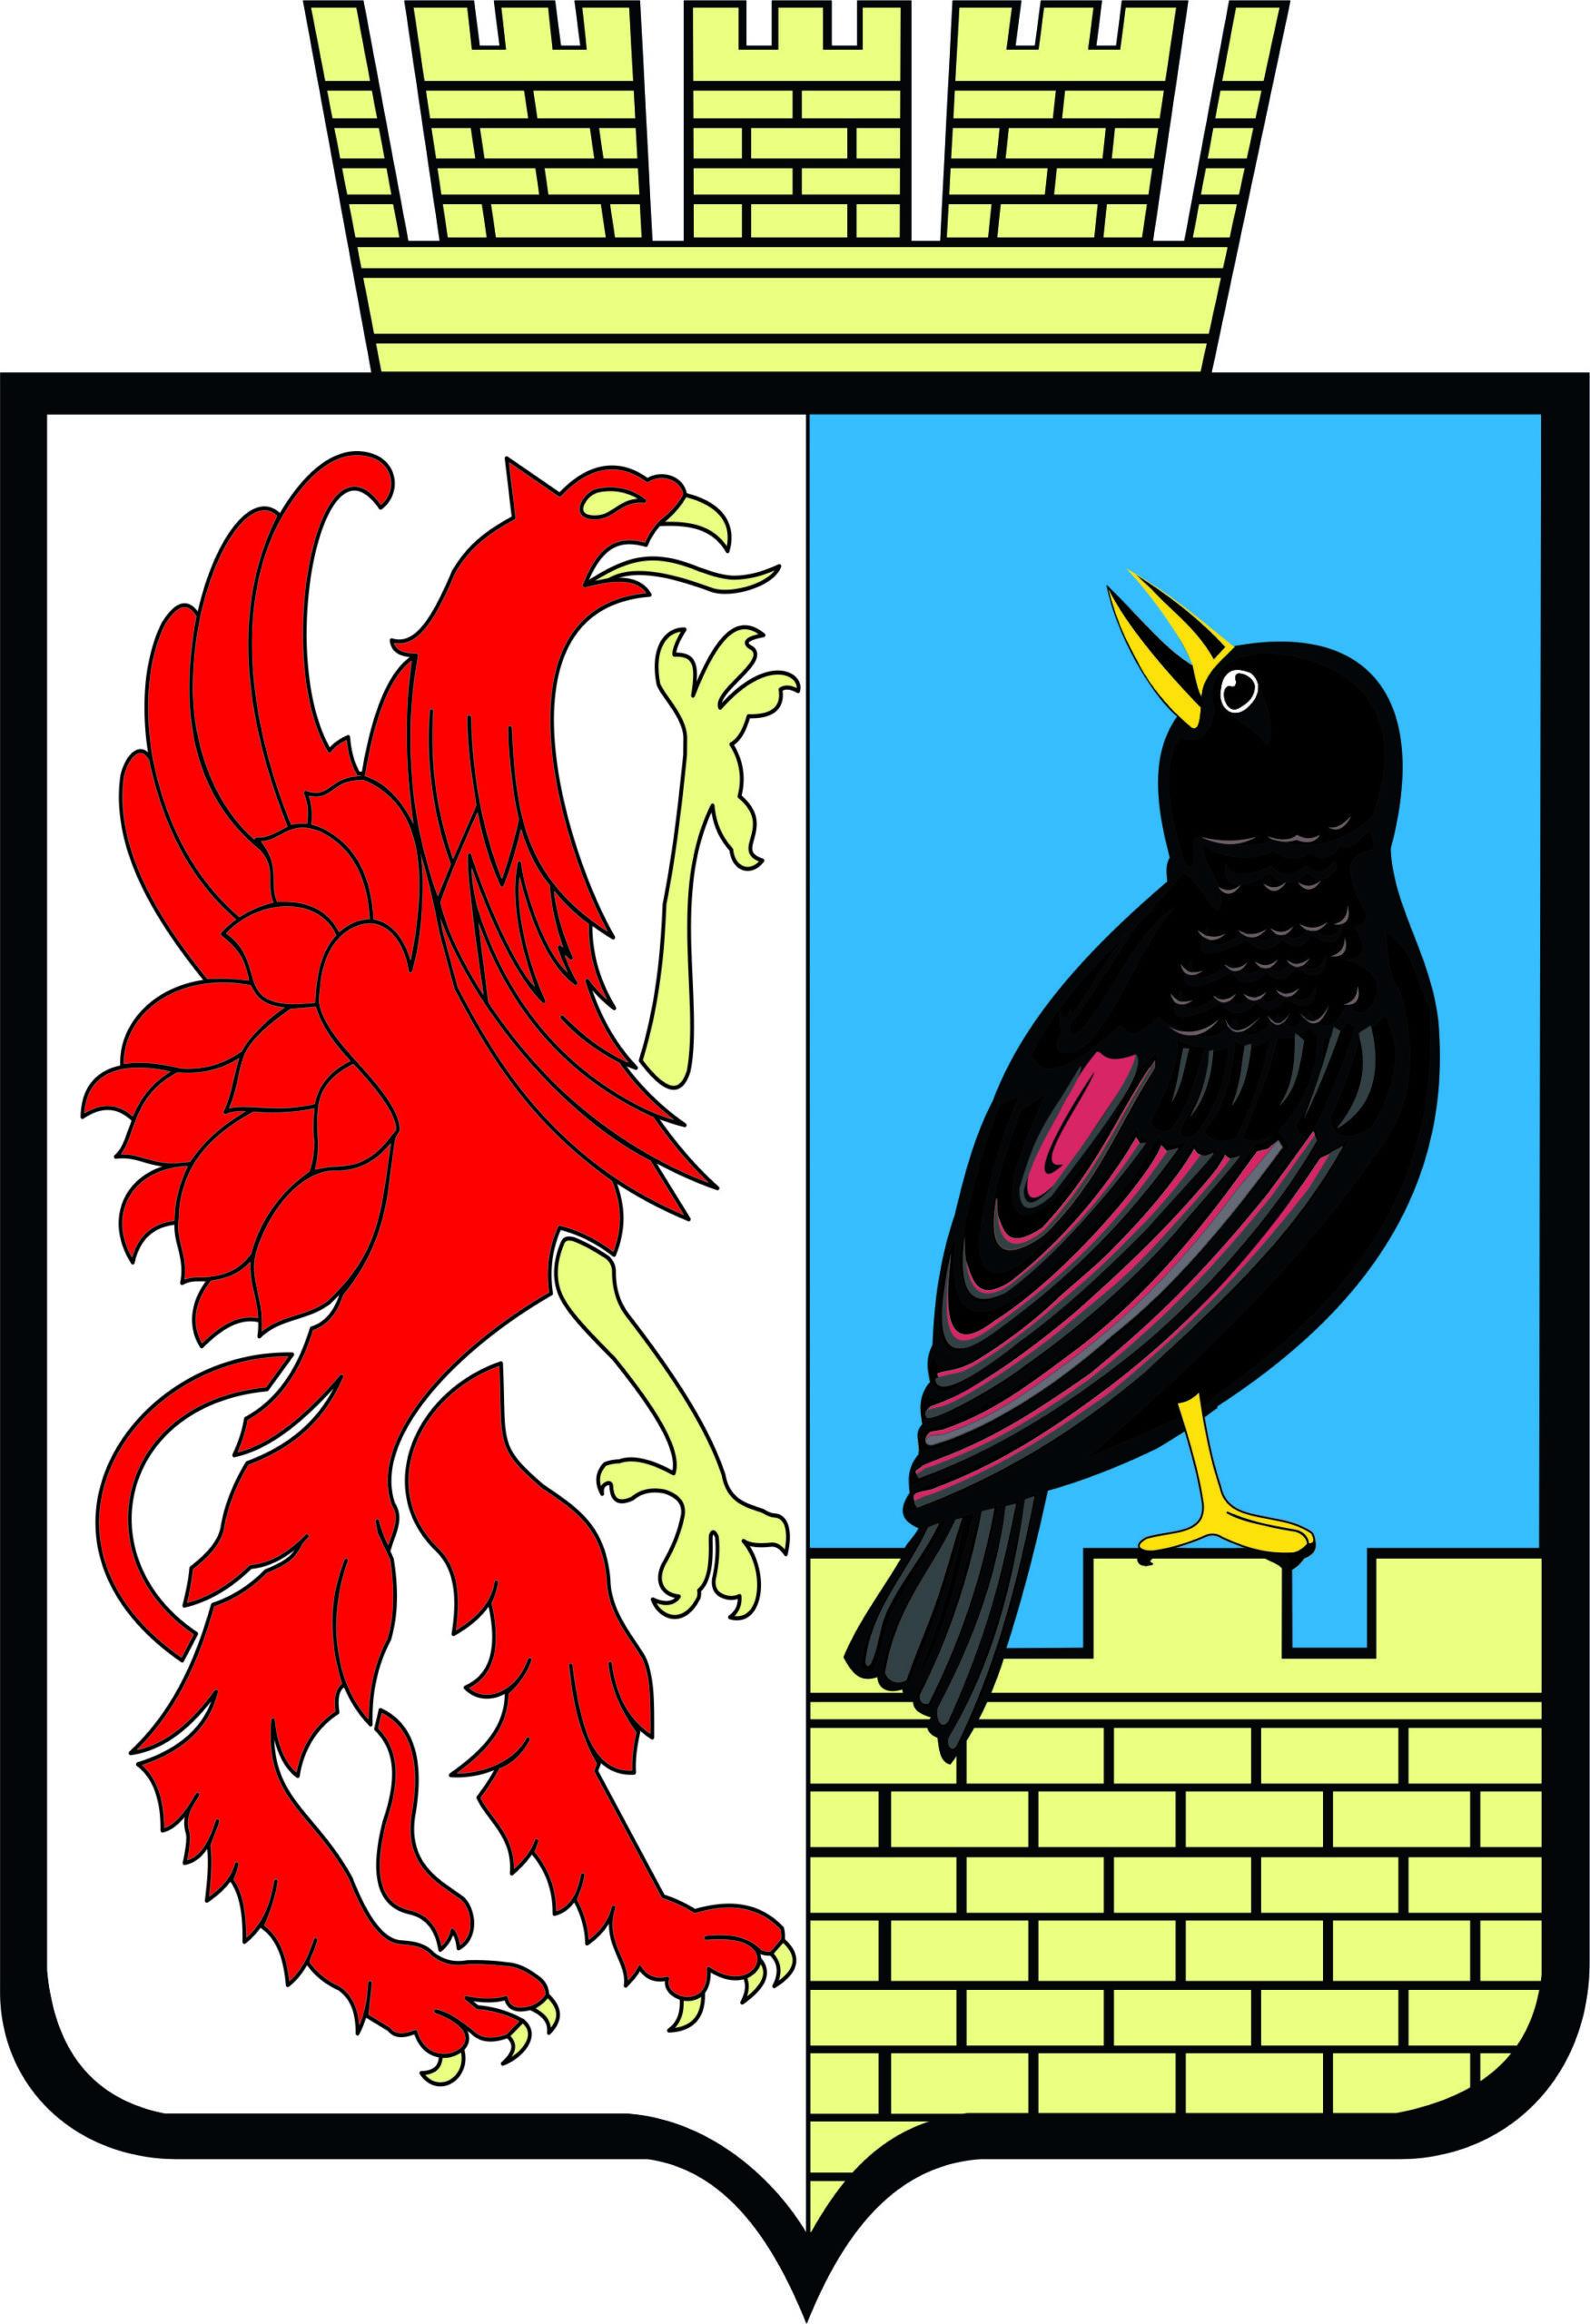 Herb gminy Skórcz gmina miejska